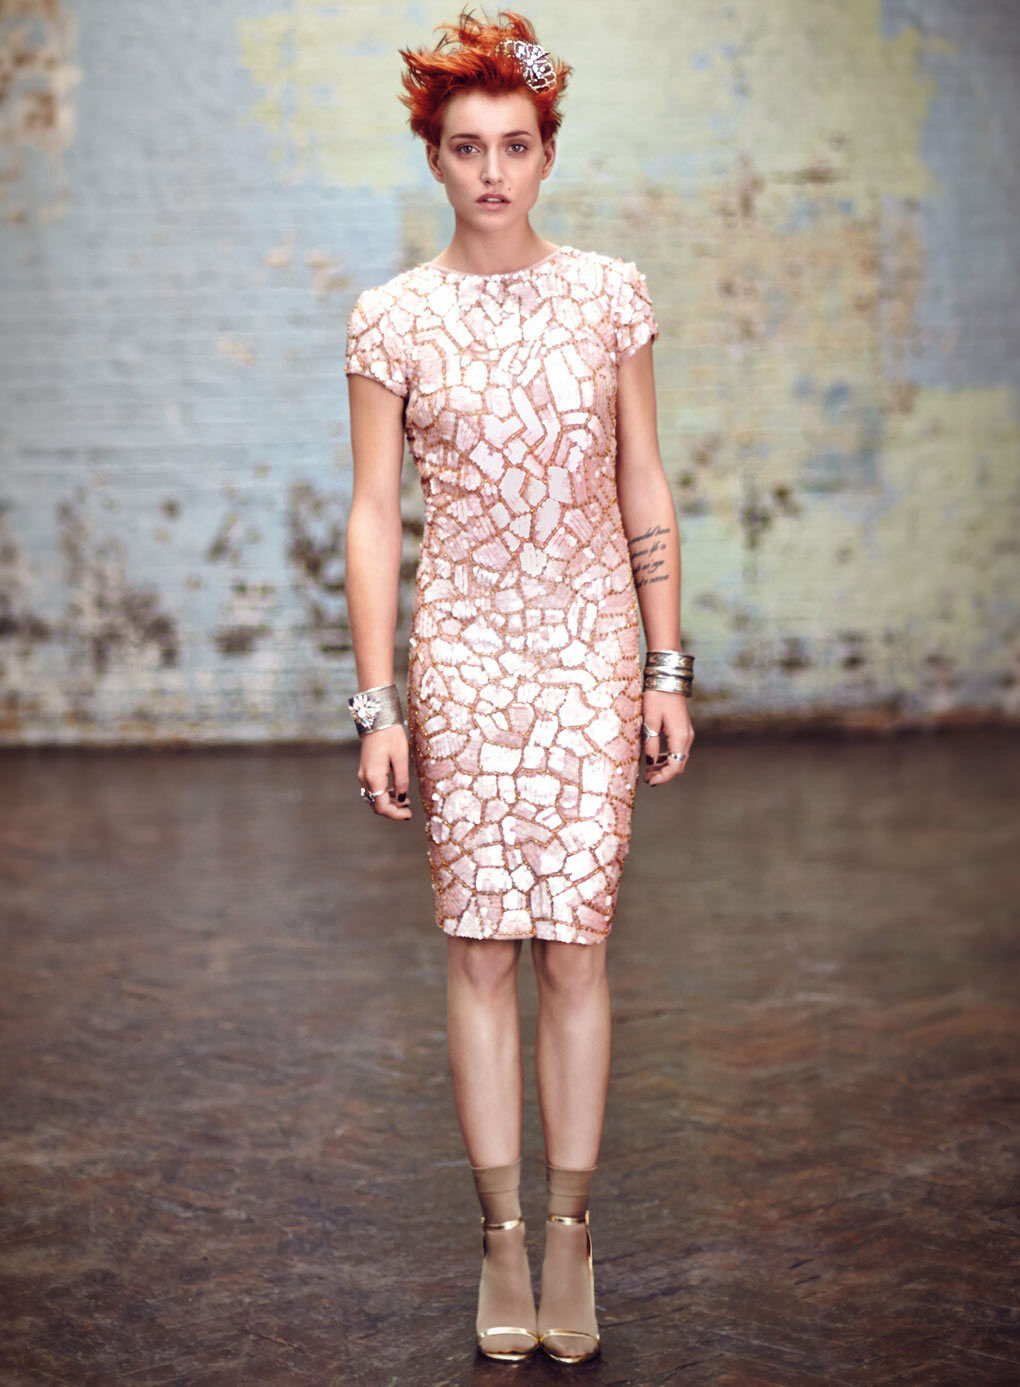 Miss selfridge sassy sequin bodycon dress size 6 bnwt rrp .00